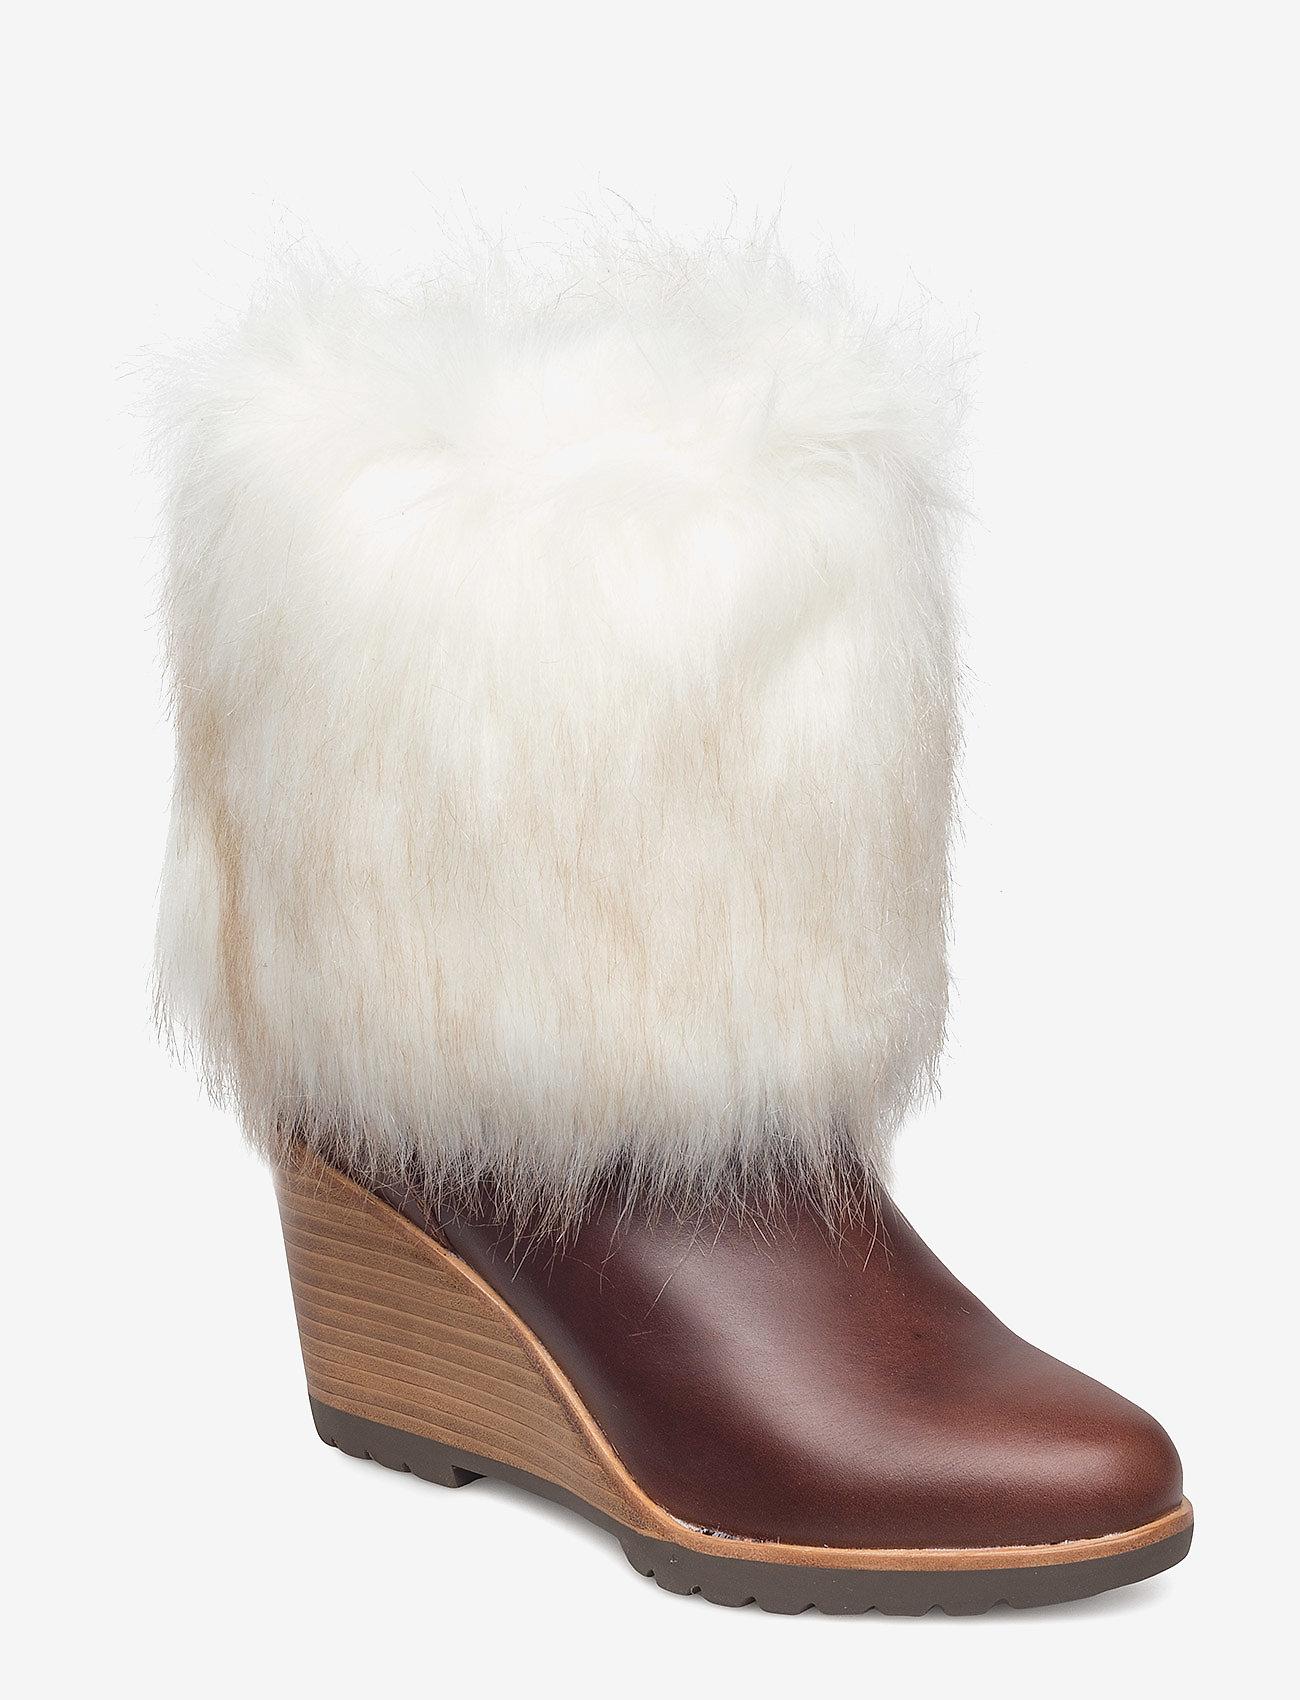 Sorel - PARK CITY SHORT - warm lined boots - elk - 0